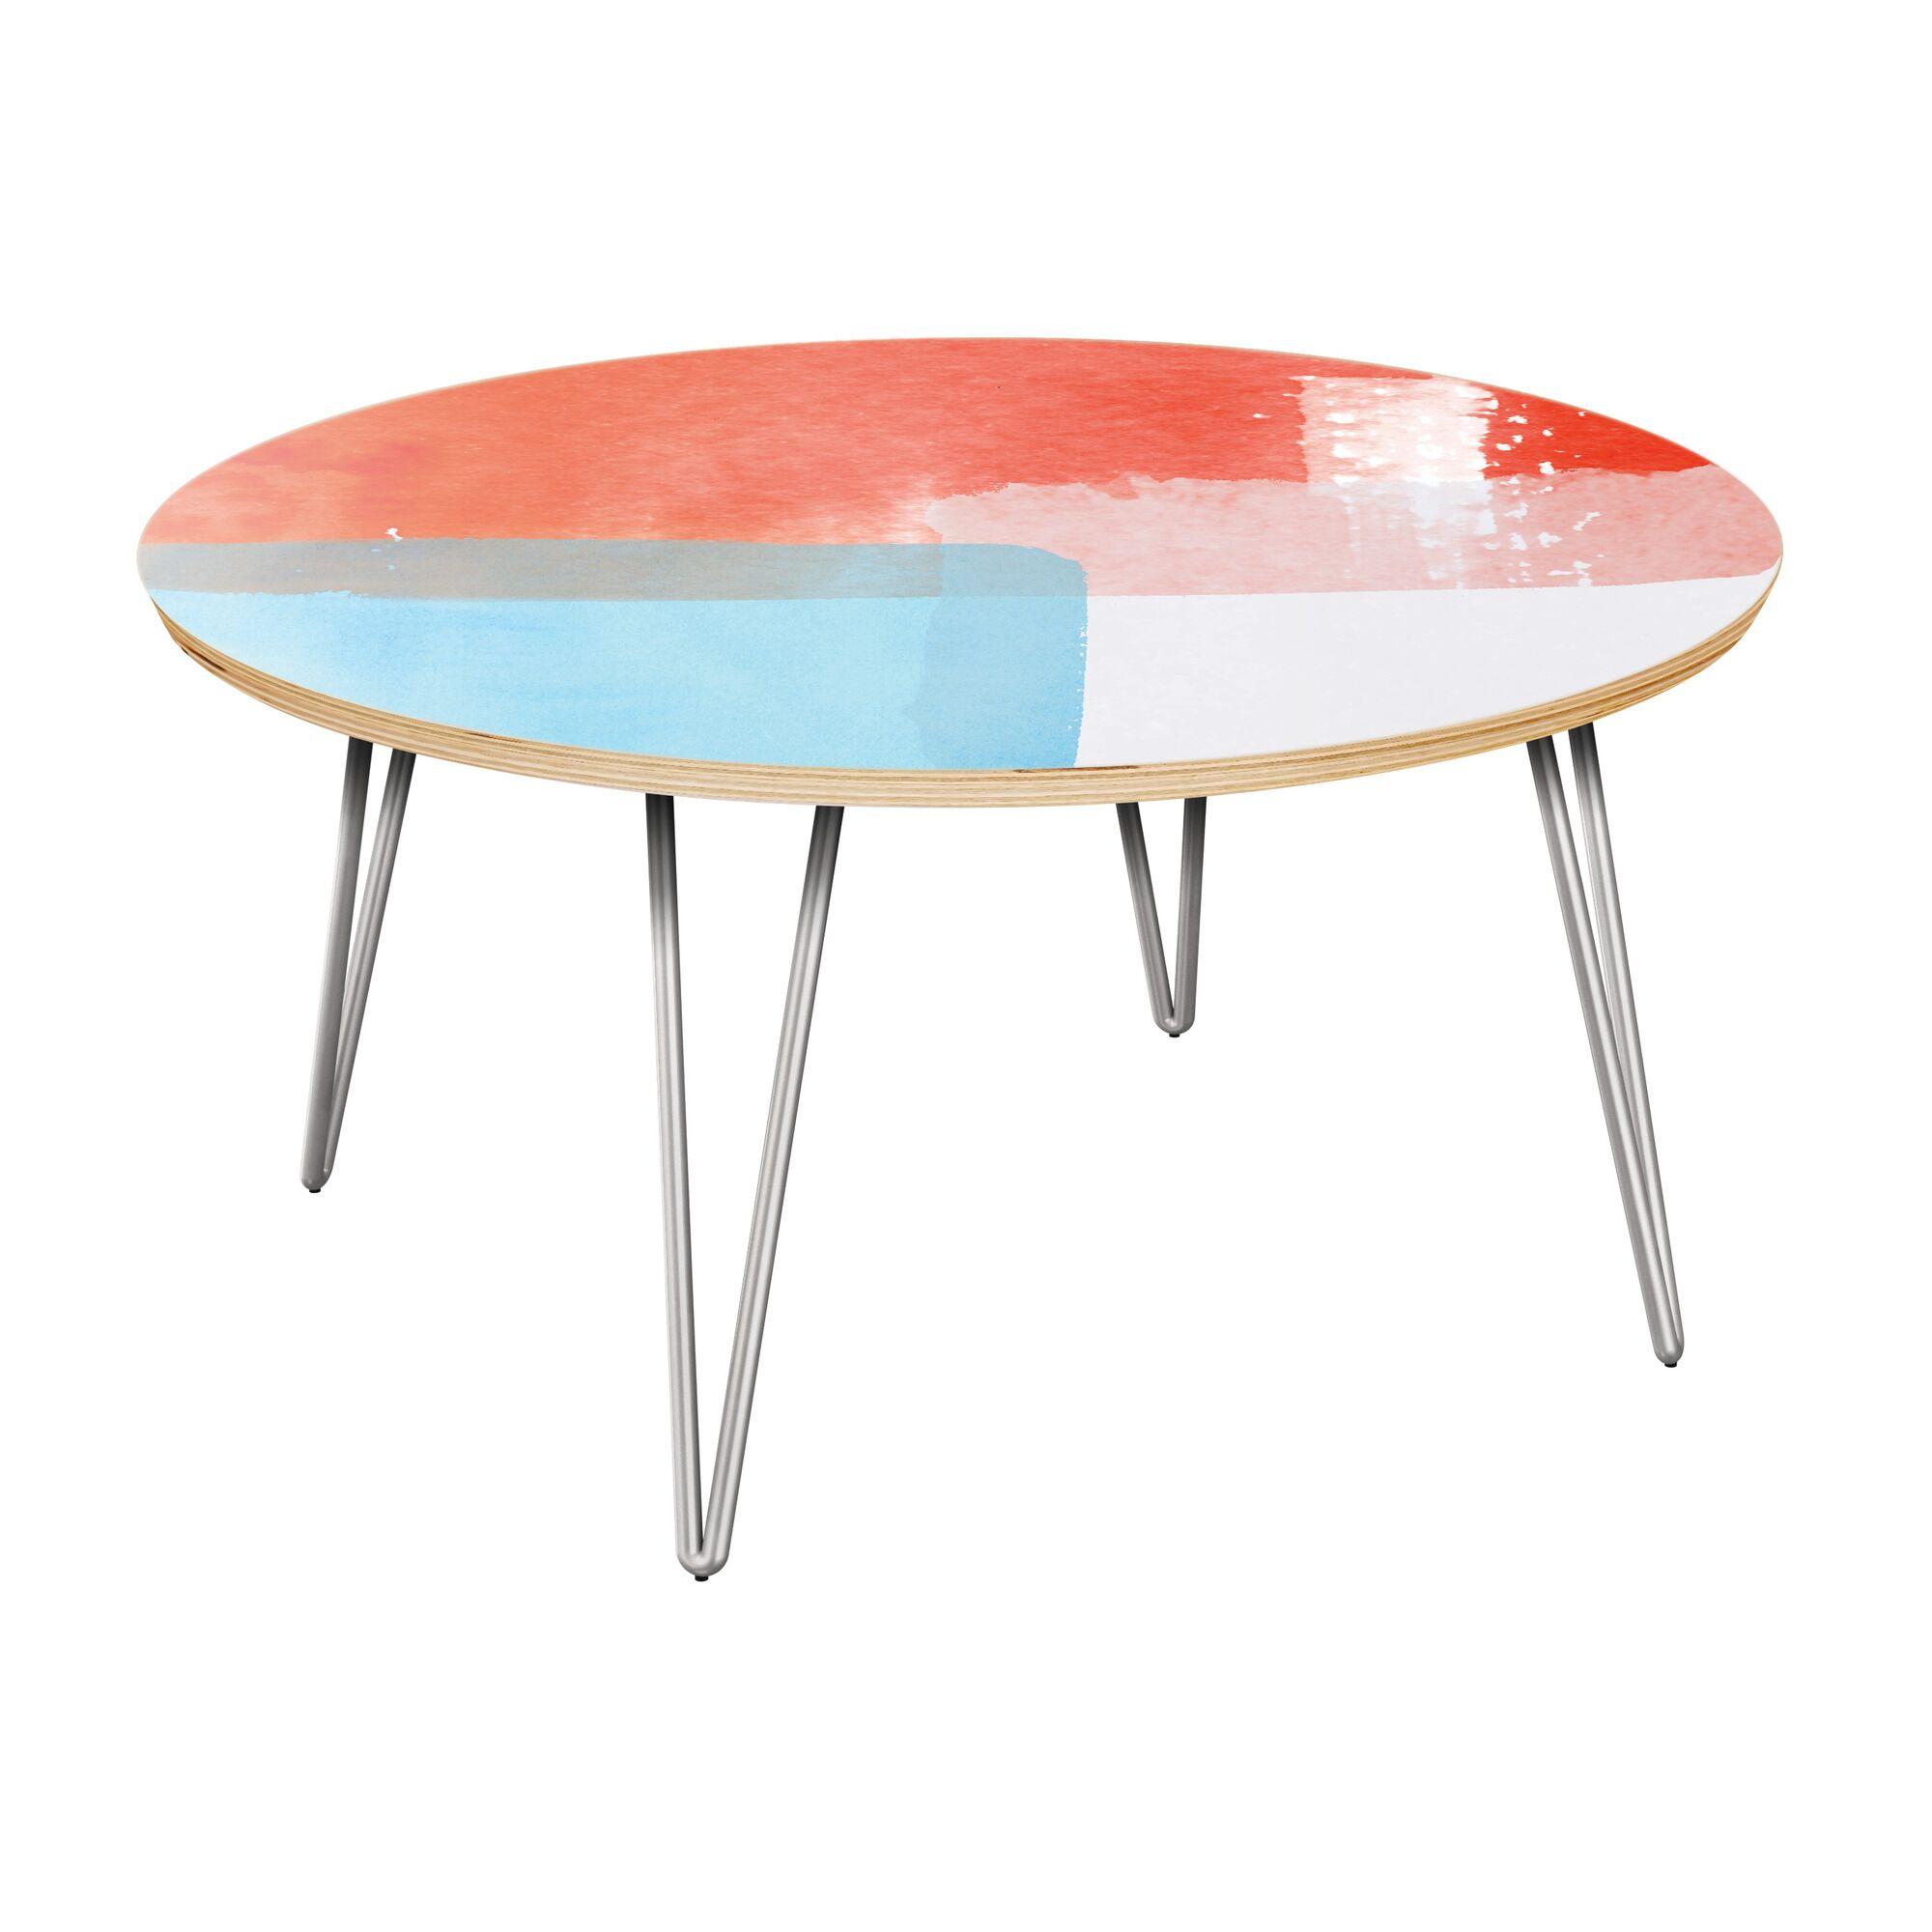 Estaugh Coffee Table Table Top Color: Natural, Table Base Color: Chrome